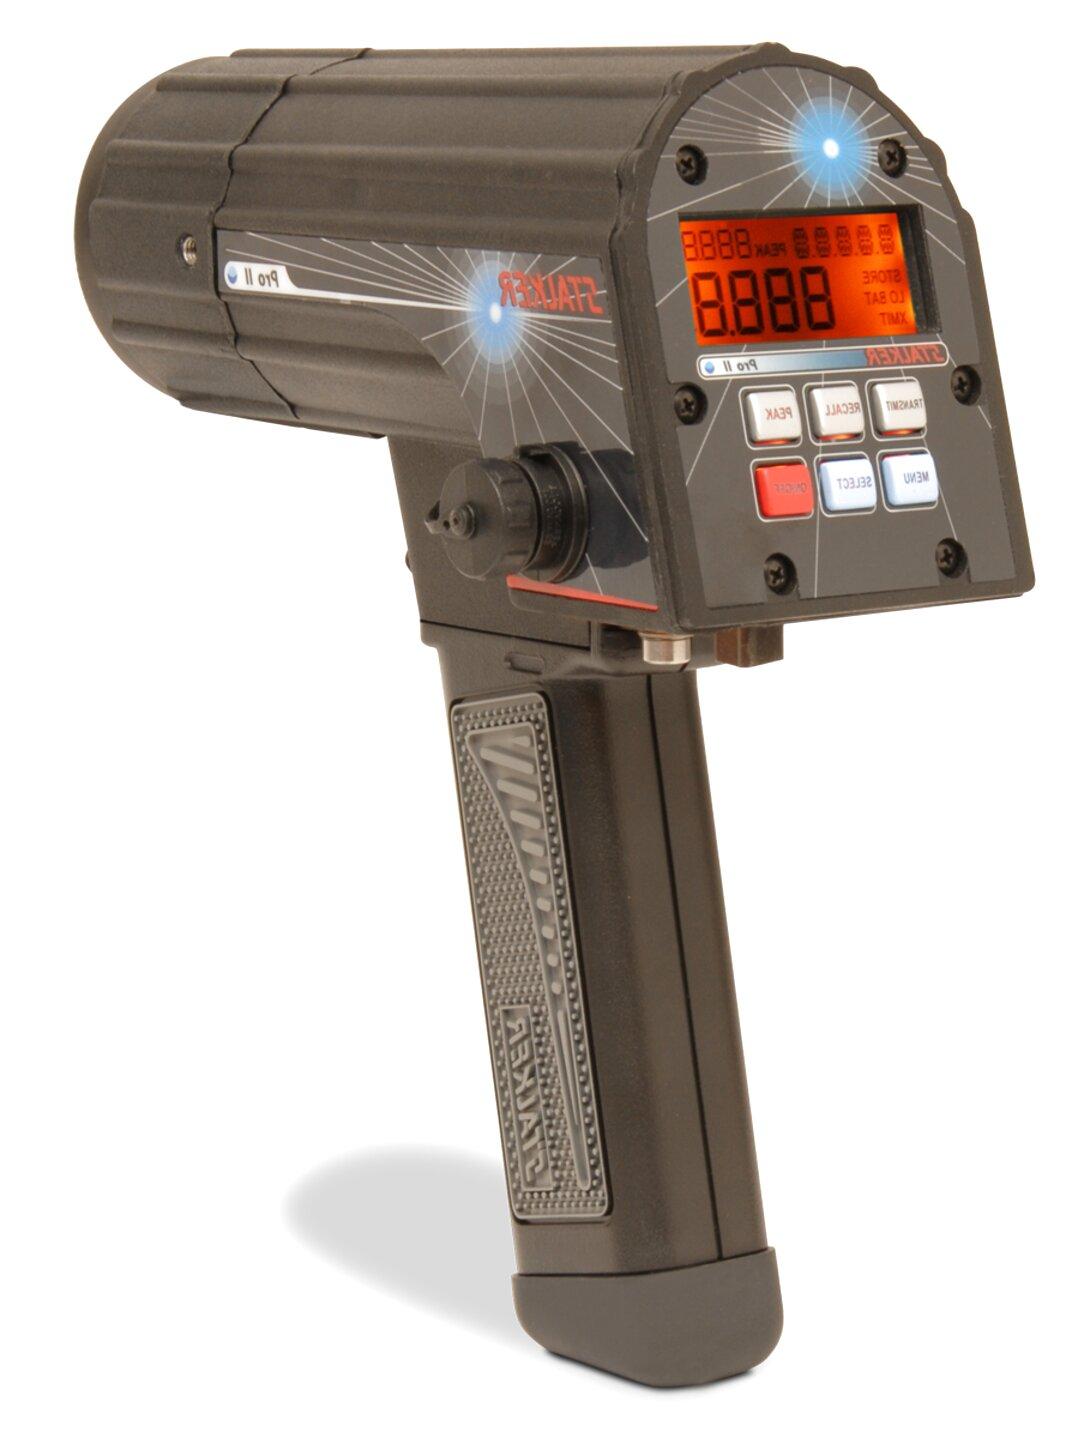 hand held radar gun for sale